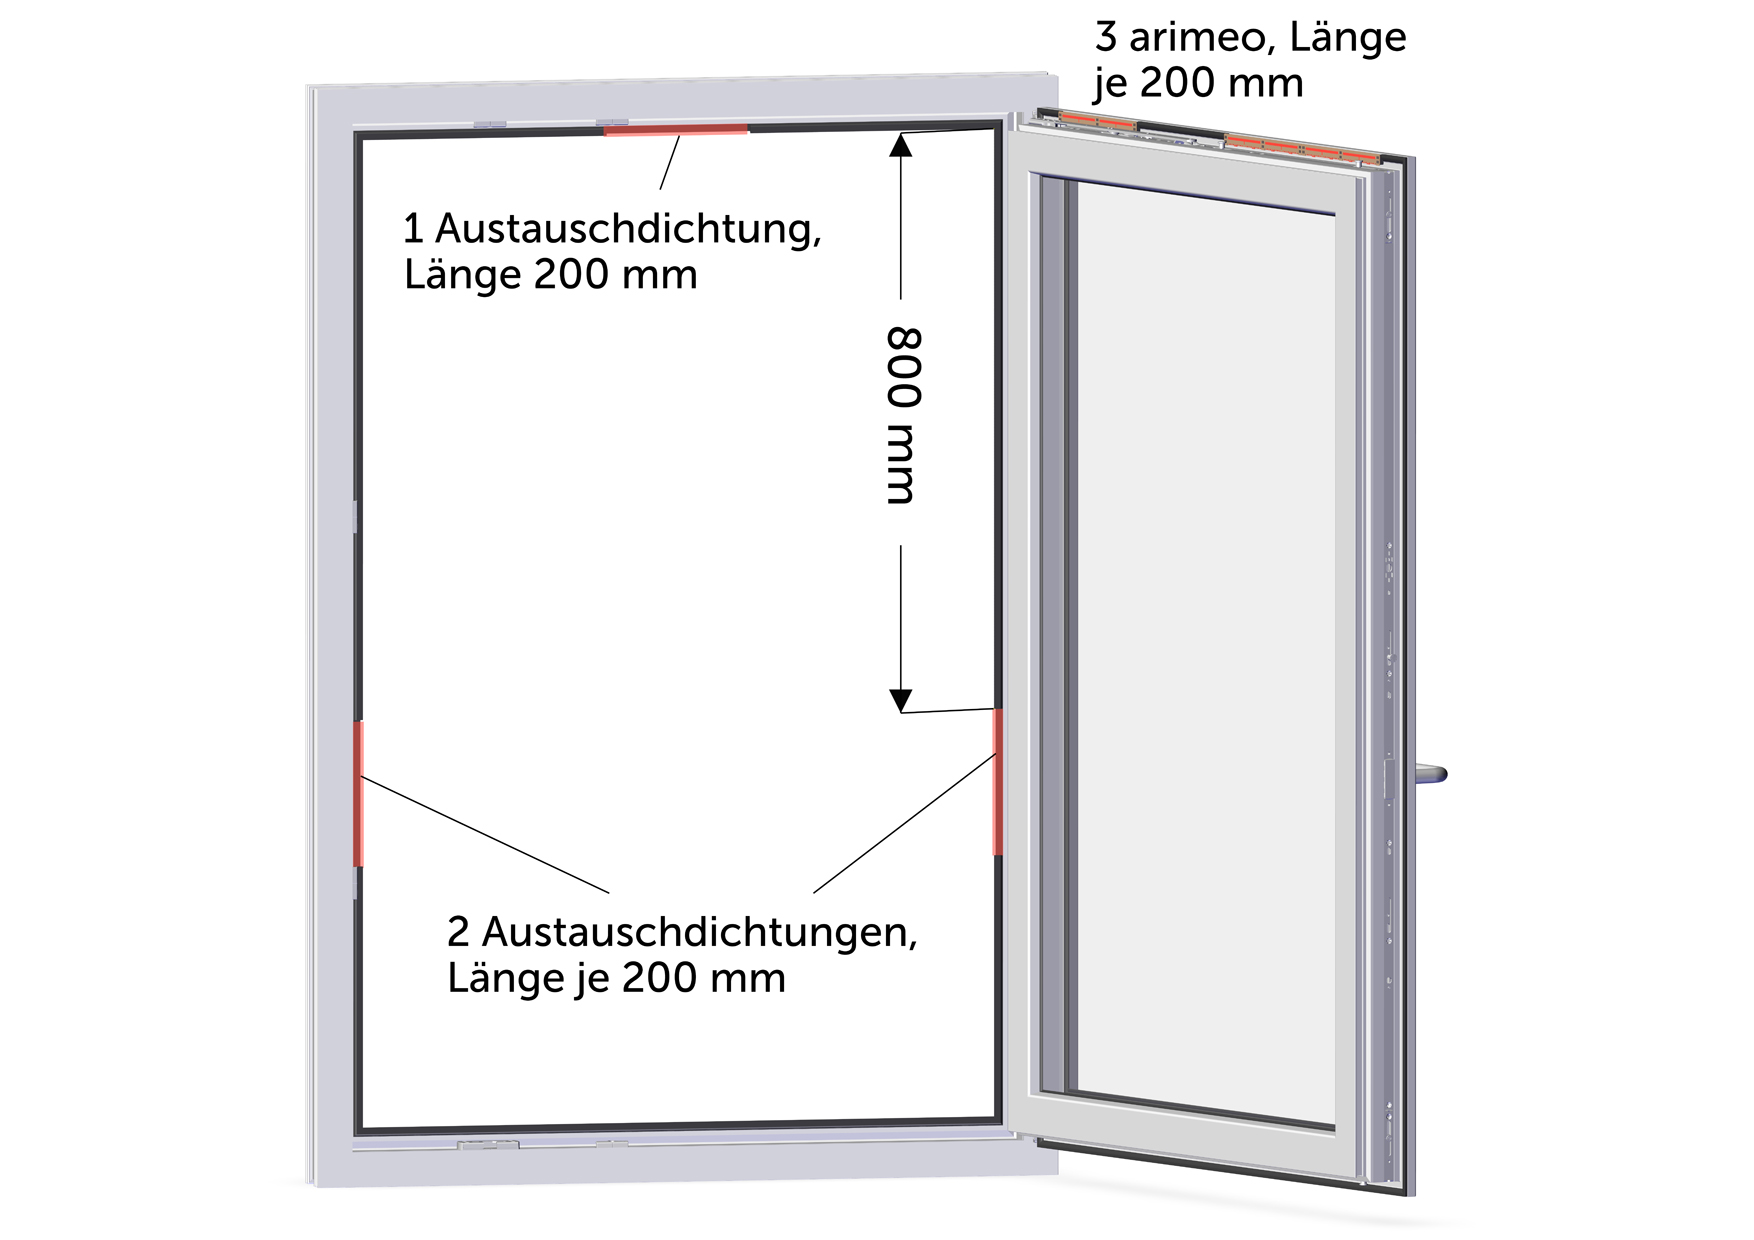 arimeo classic S Fensterfalzlüfter Einbauvariante triple